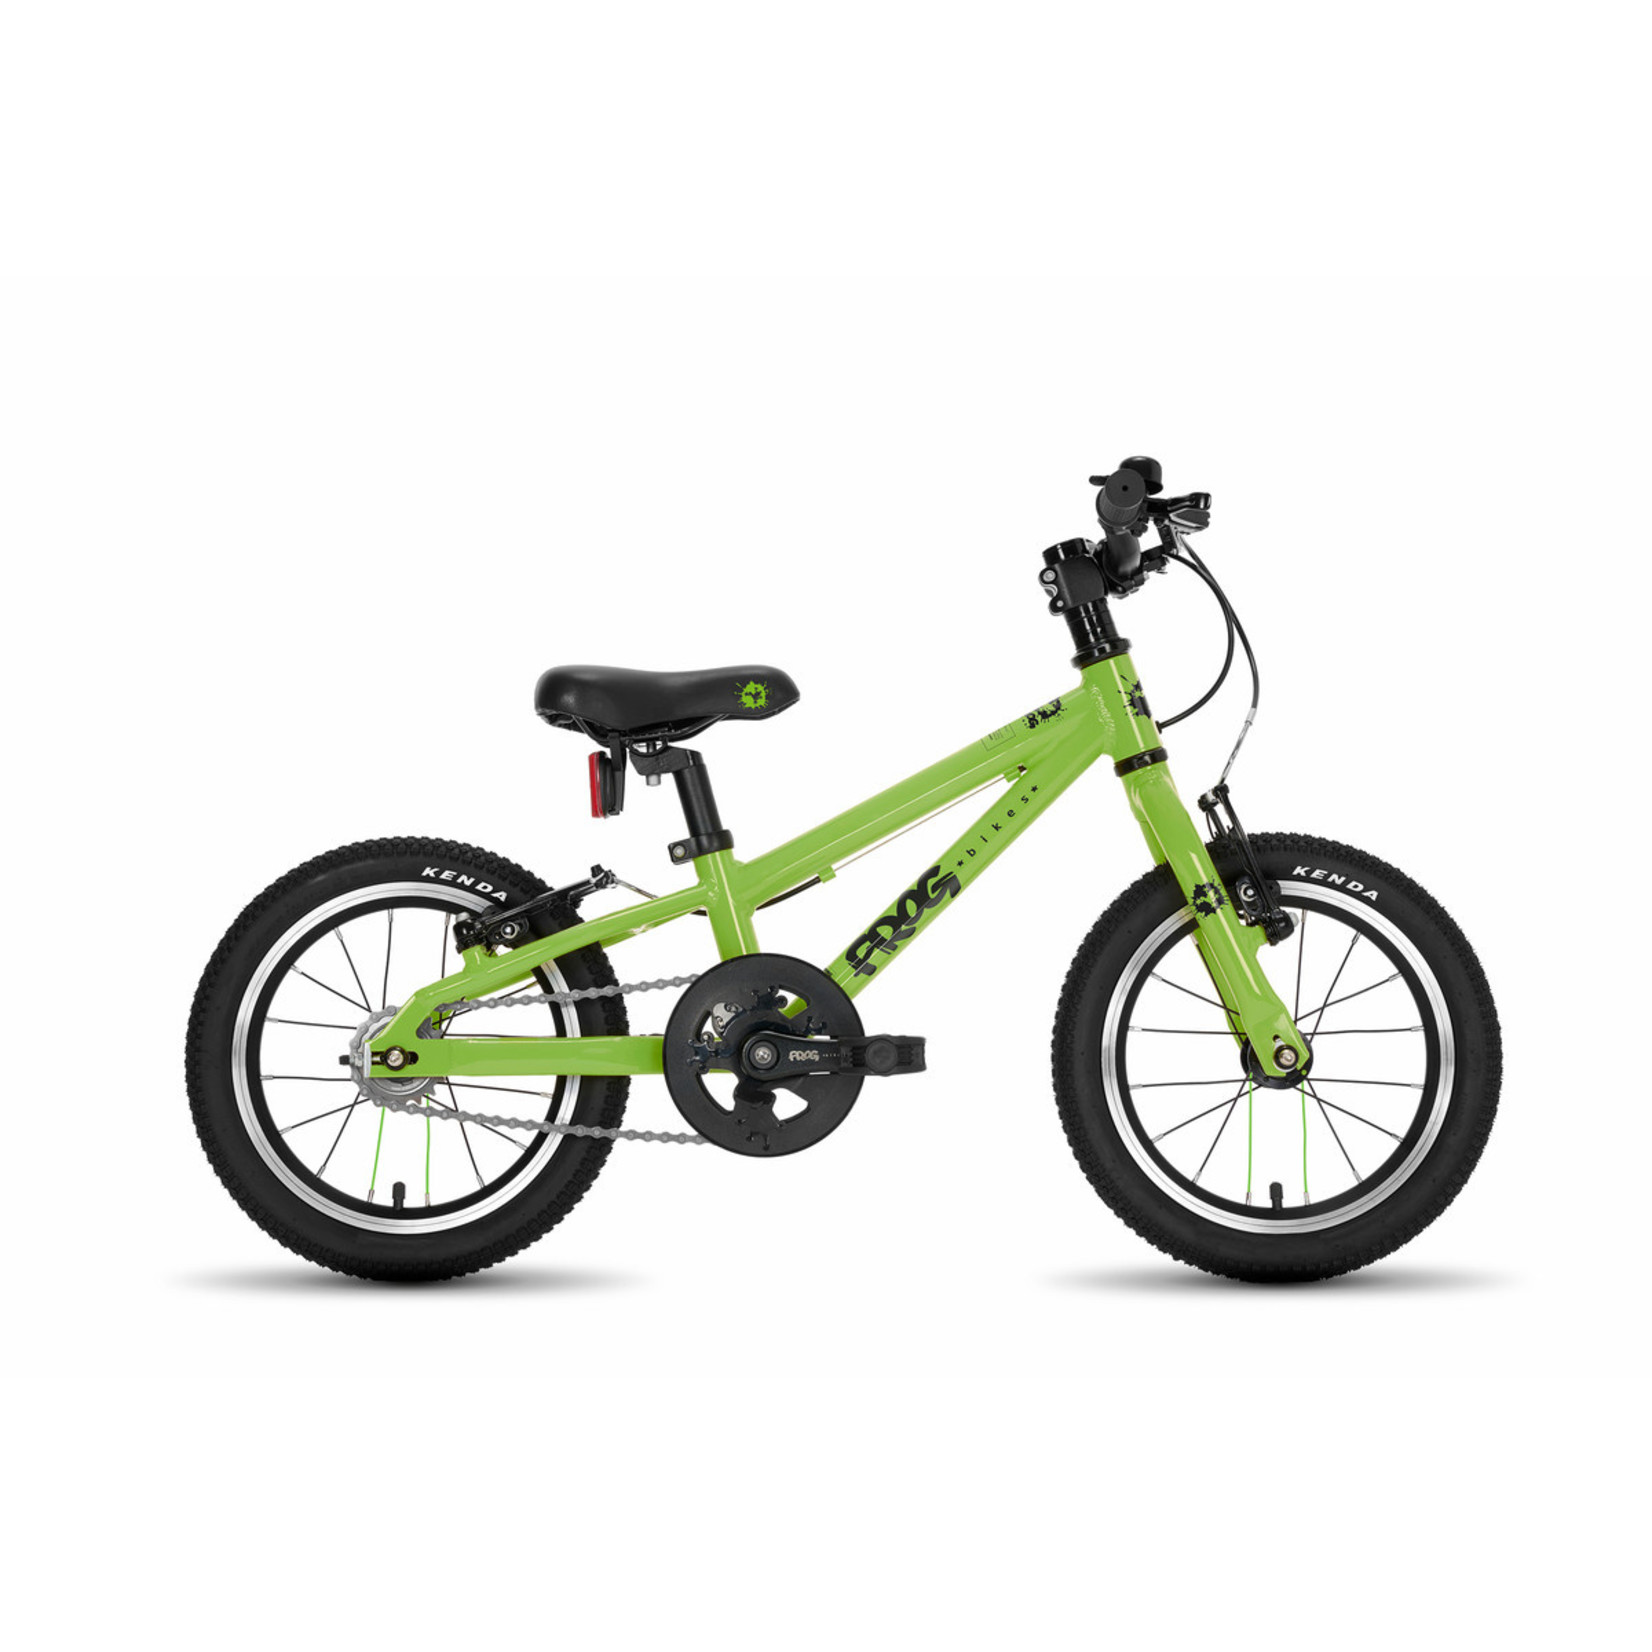 Frog Bikes Frog Bikes, Frog 40, First Pedal Bike